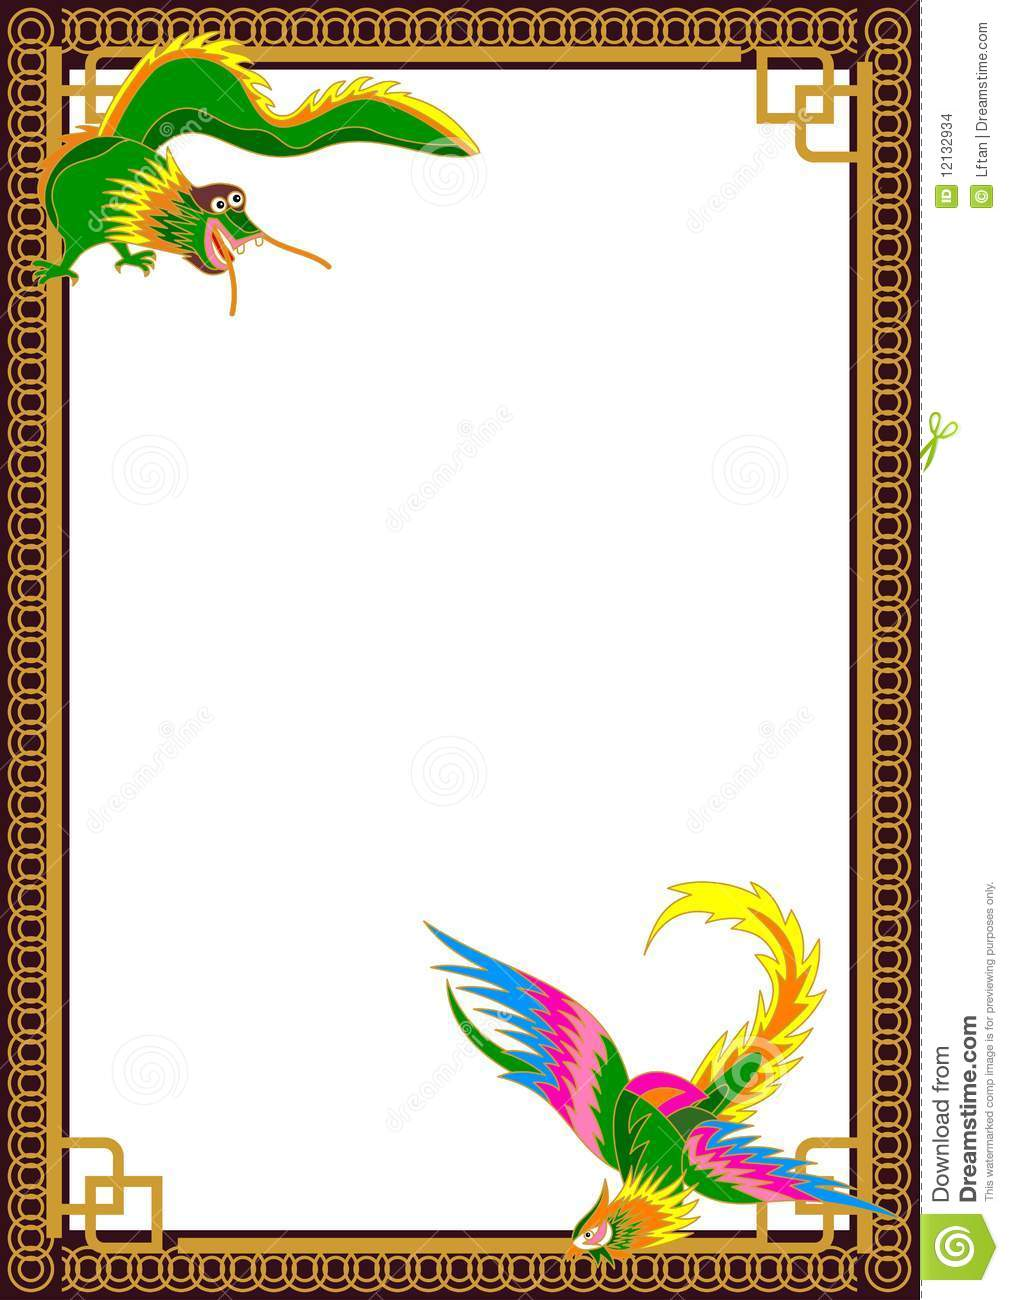 Dragon Phoenix Border stock vector. Illustration of pattern.